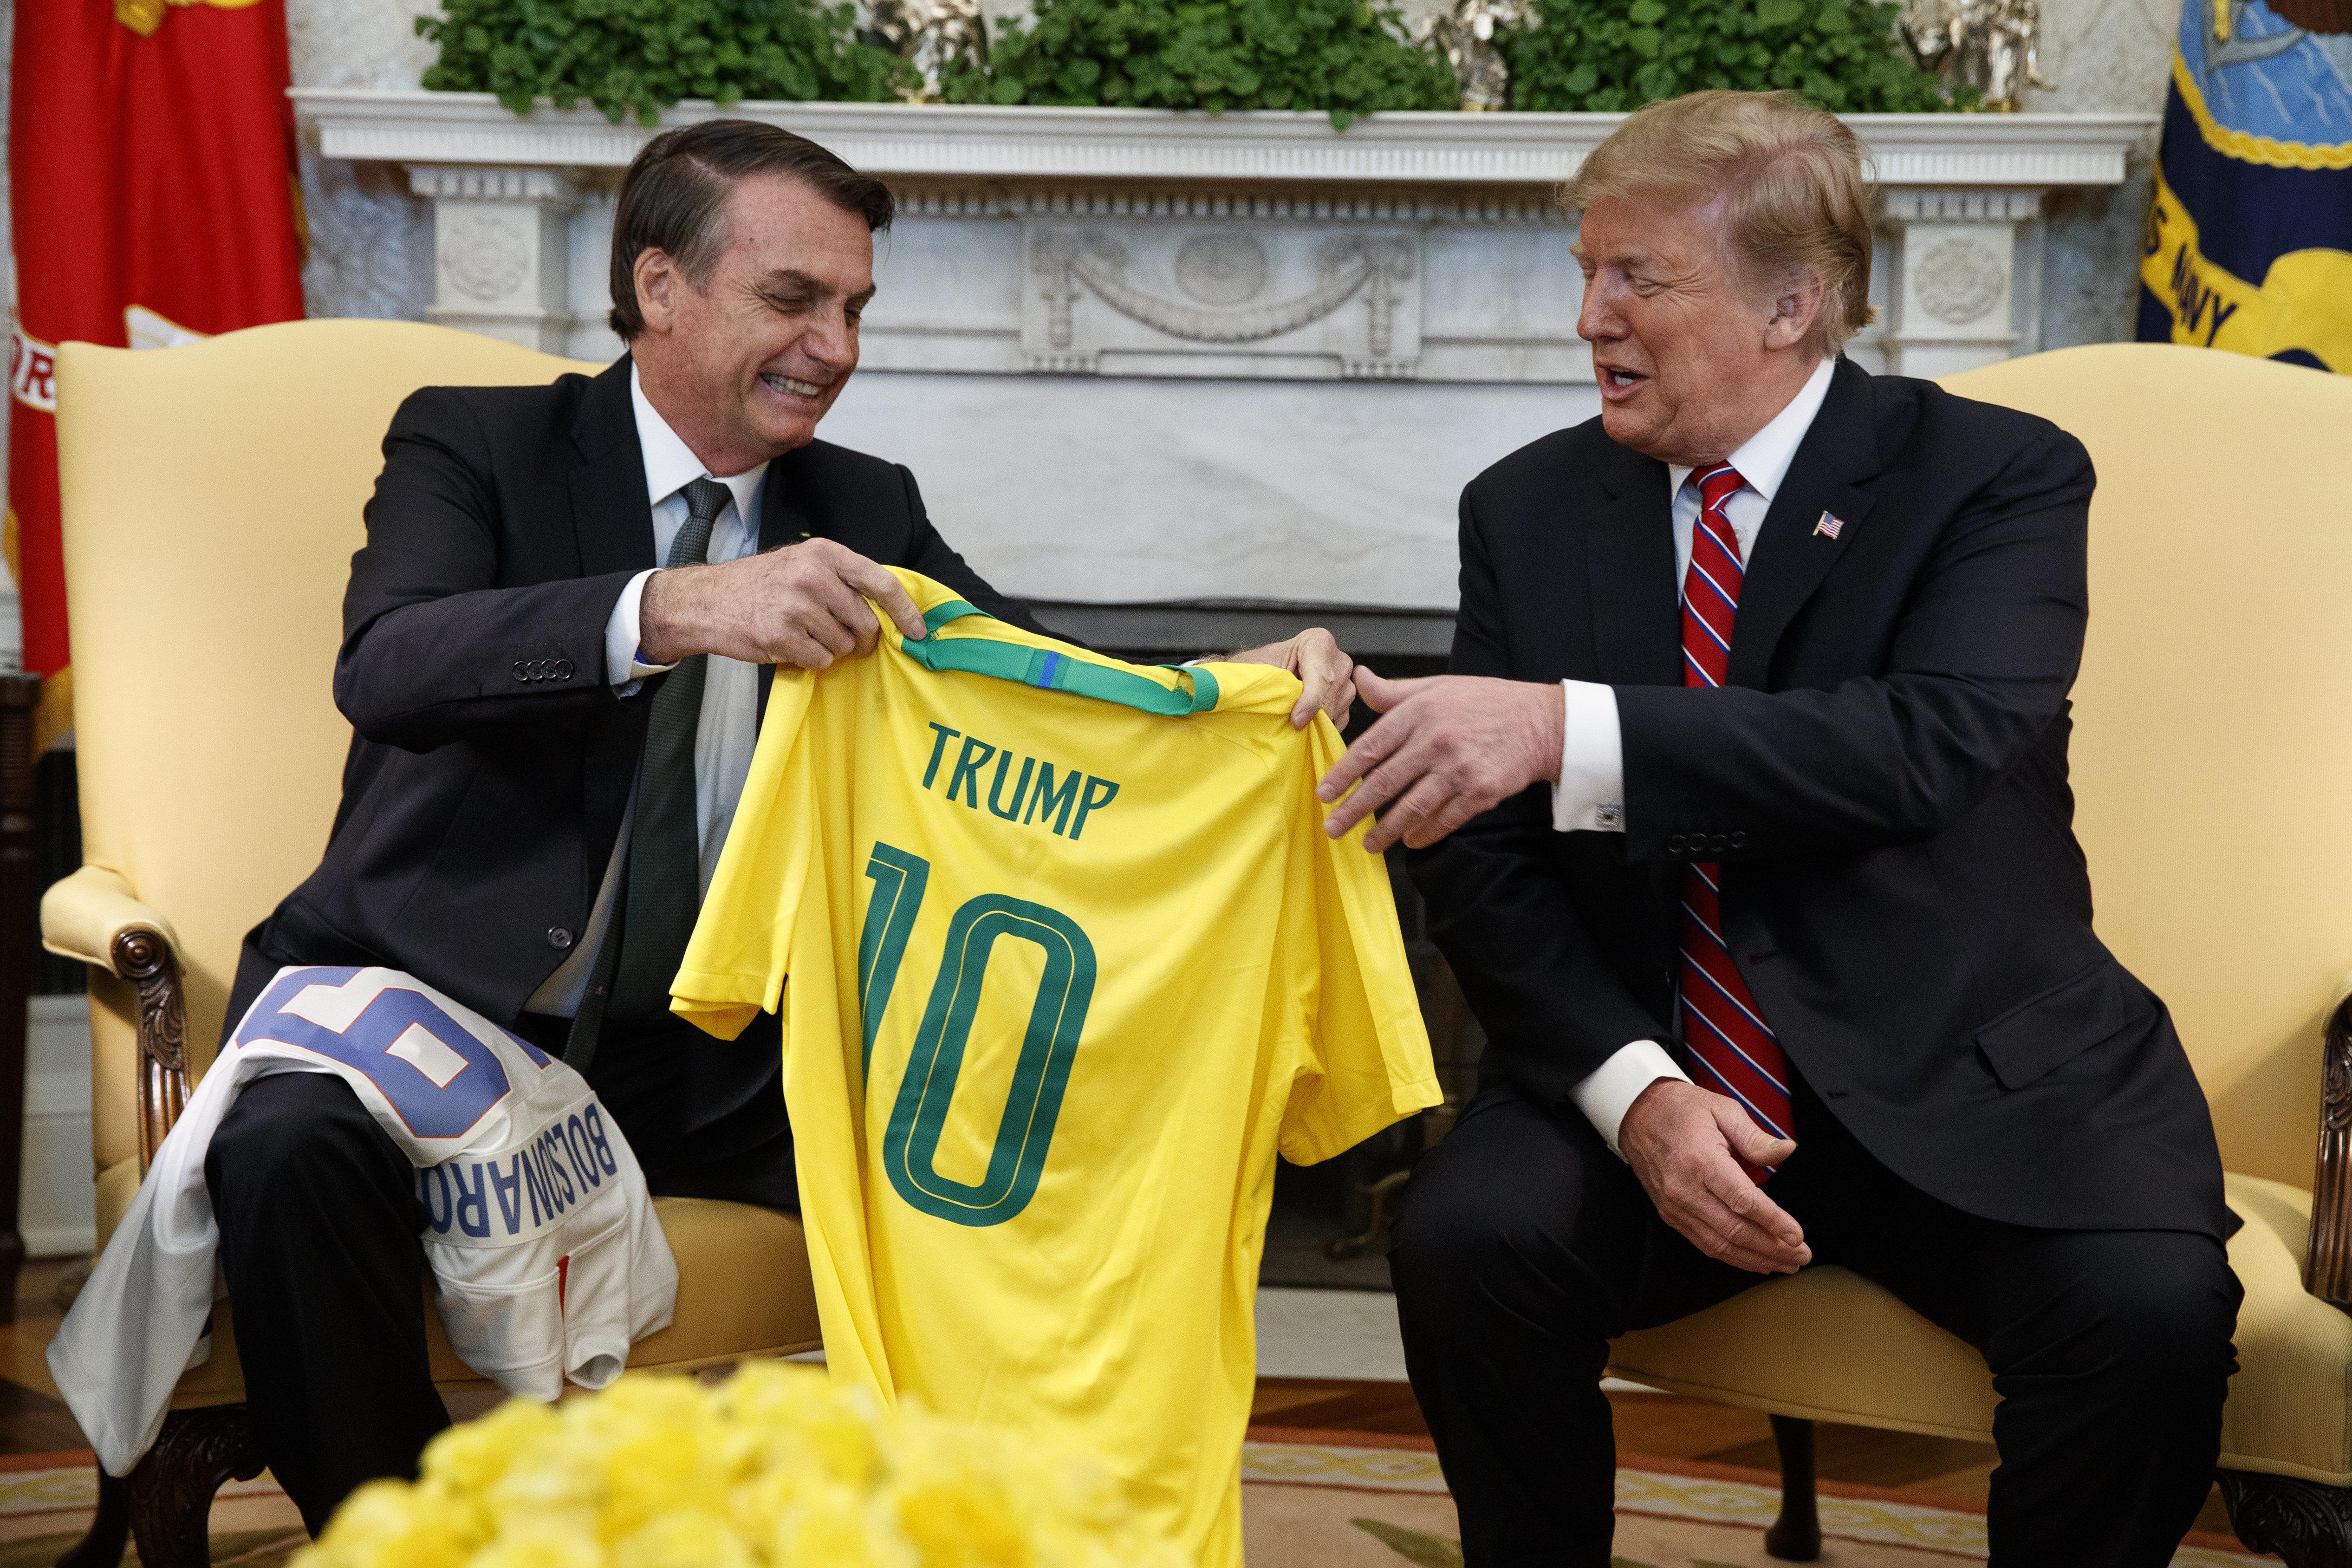 Ao receber Bolsonaro, Trump promete apoio à entrada do Brasil na